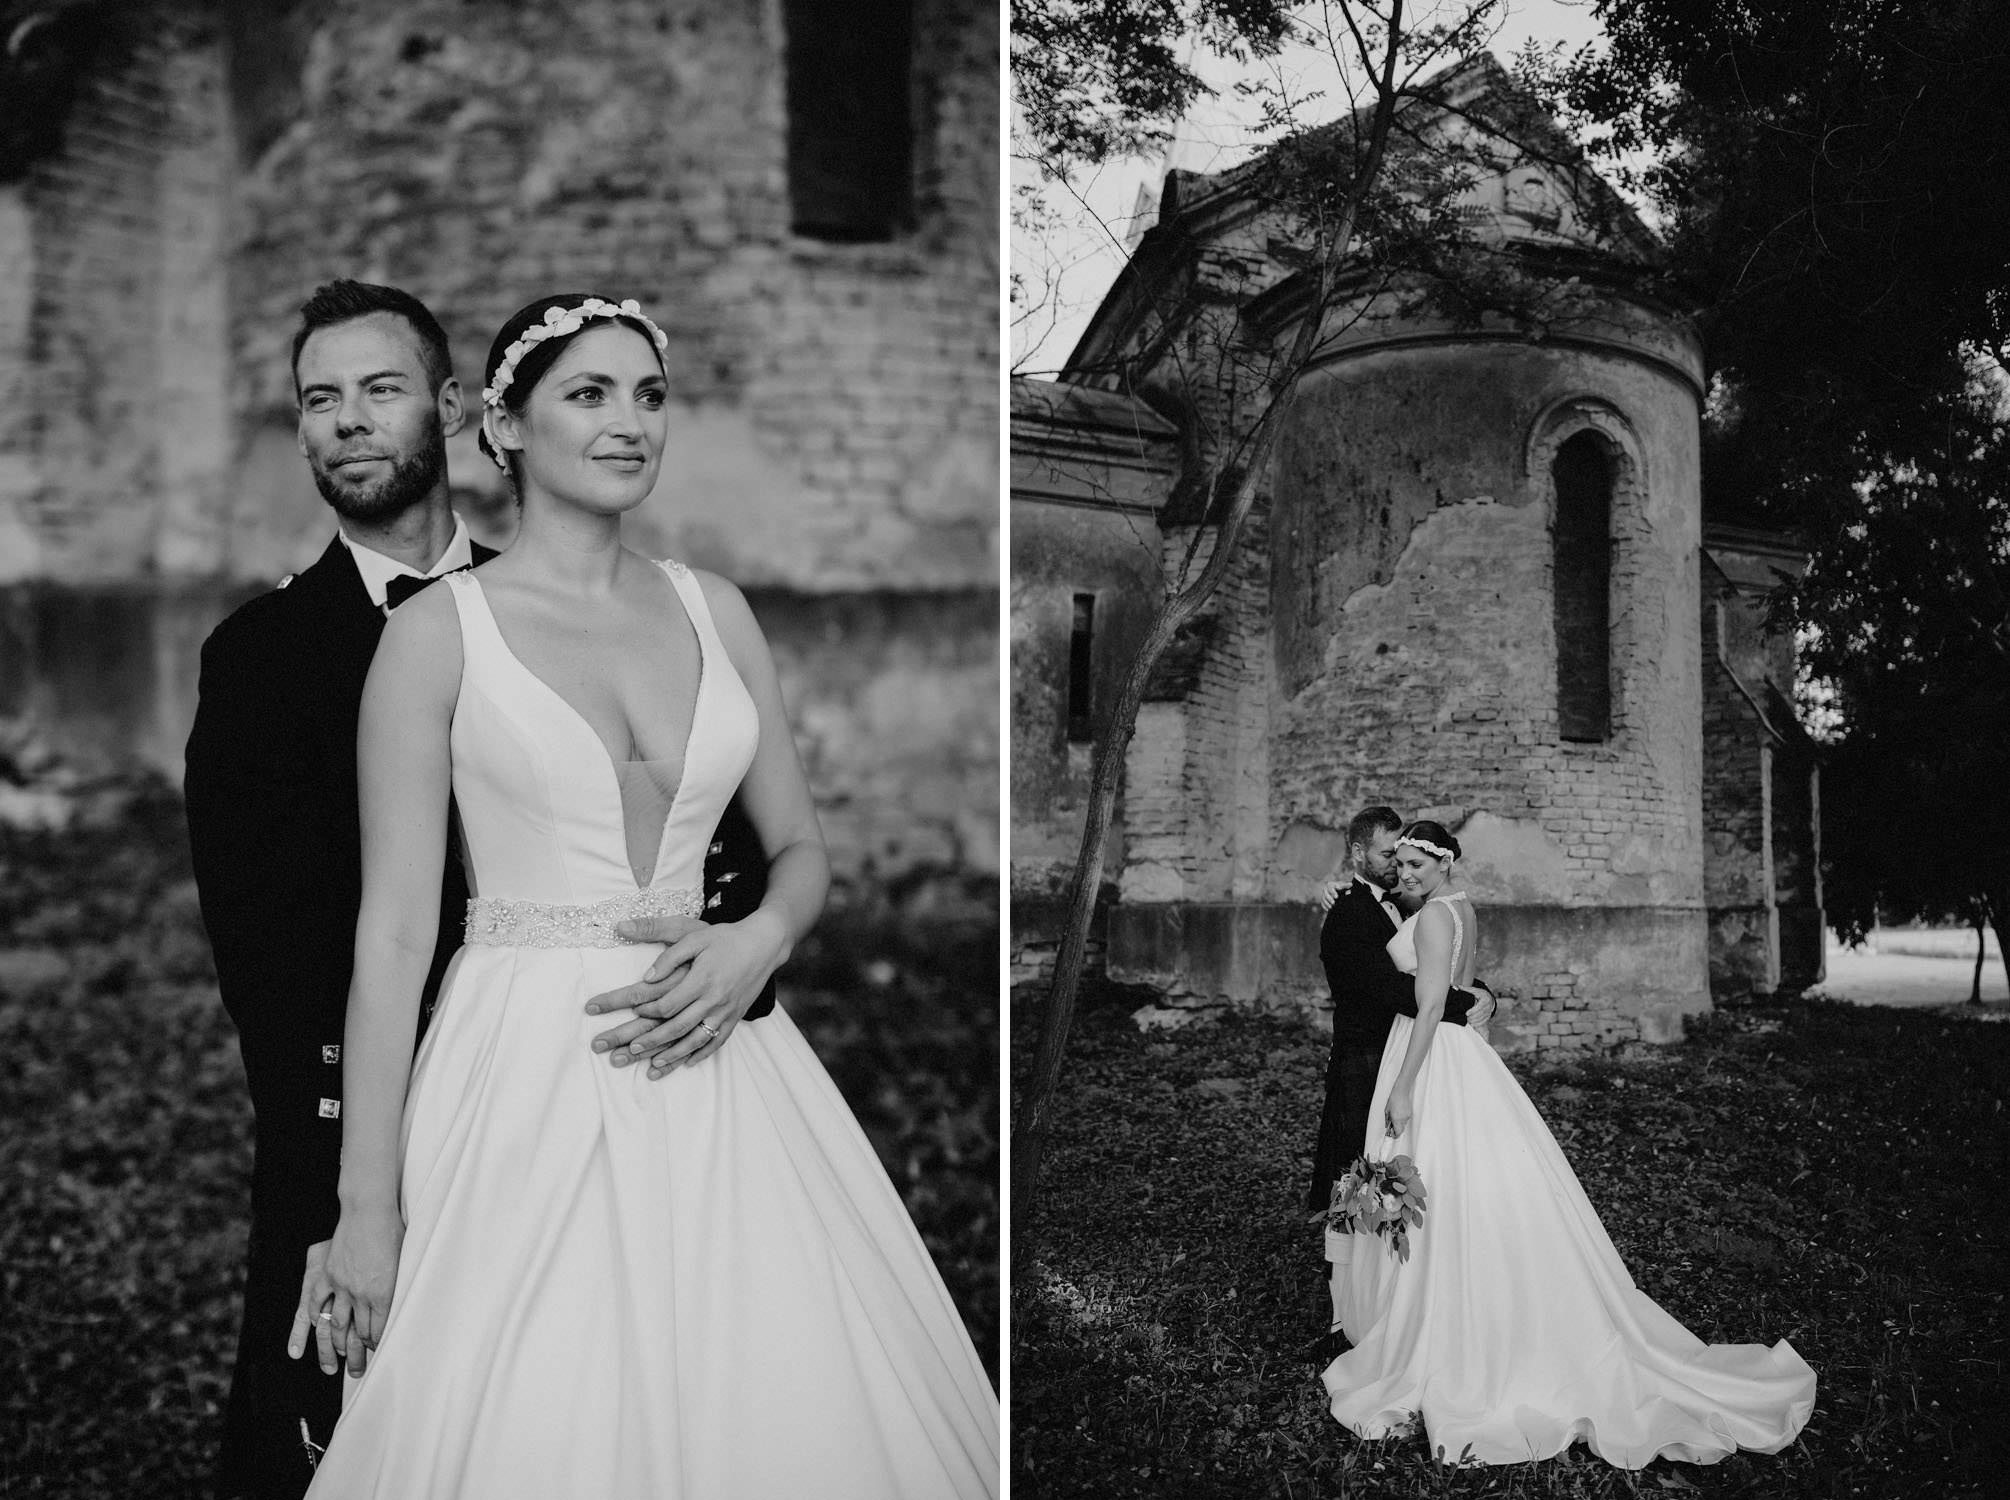 elopement-europe-photography_111(4685)2.jpg